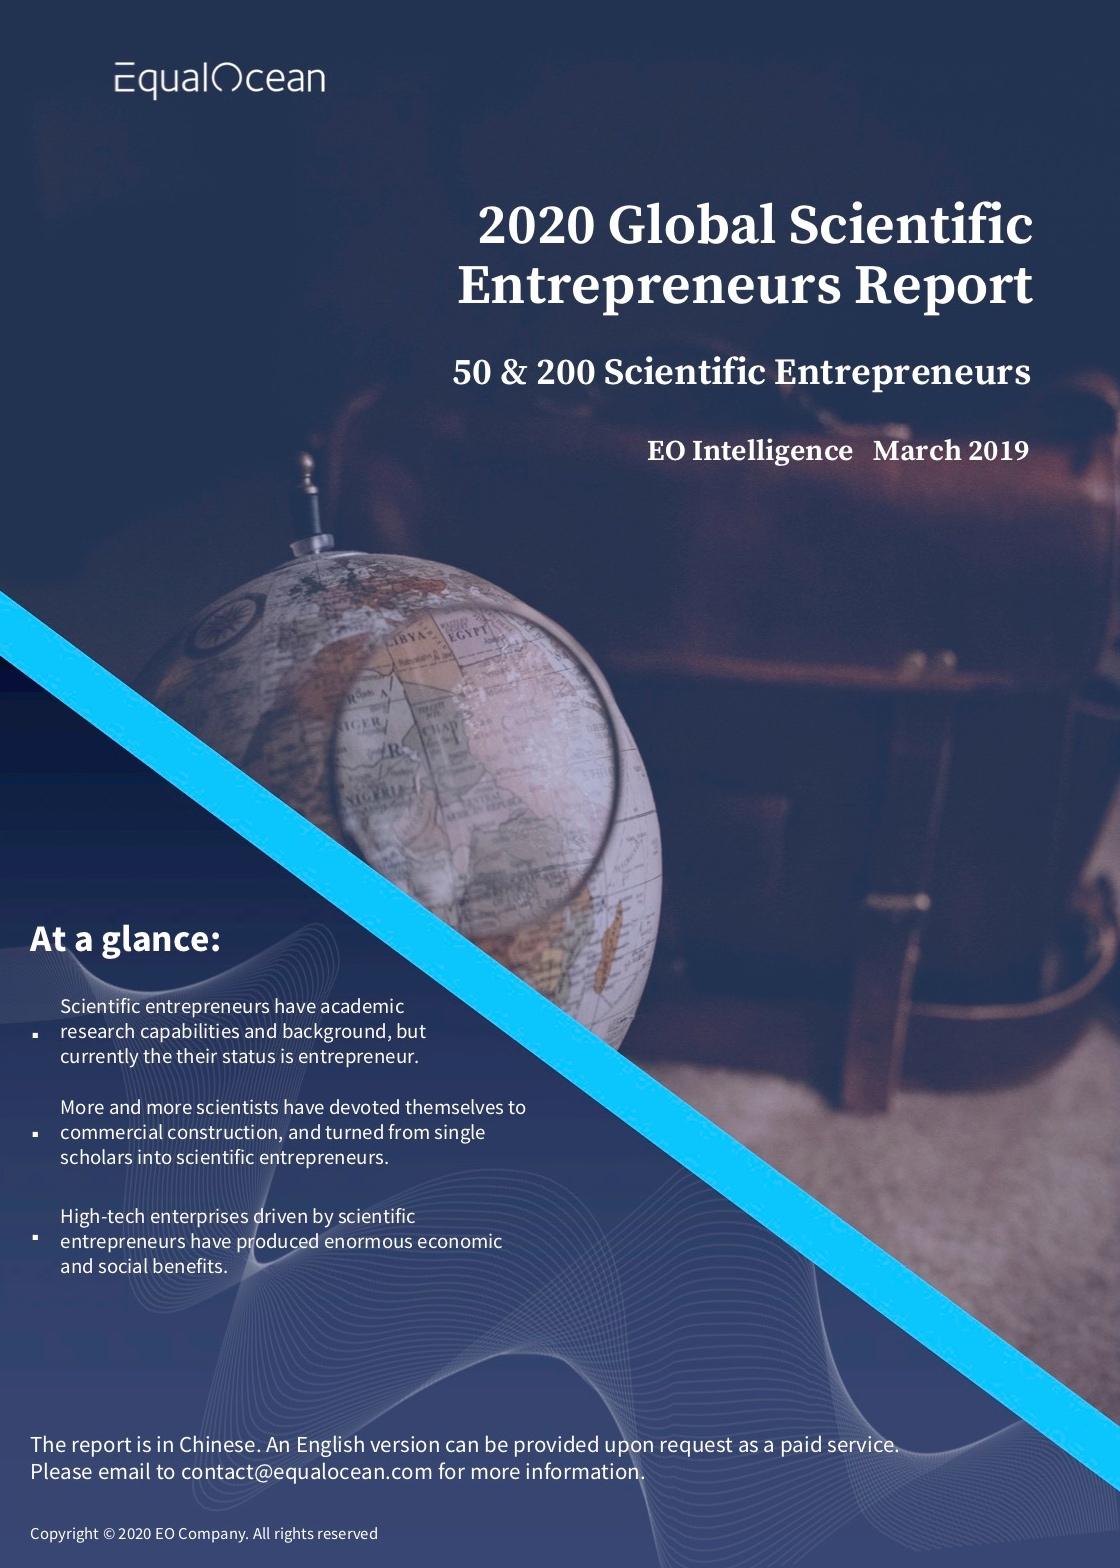 Global Scientific Entrepreneurs 2020